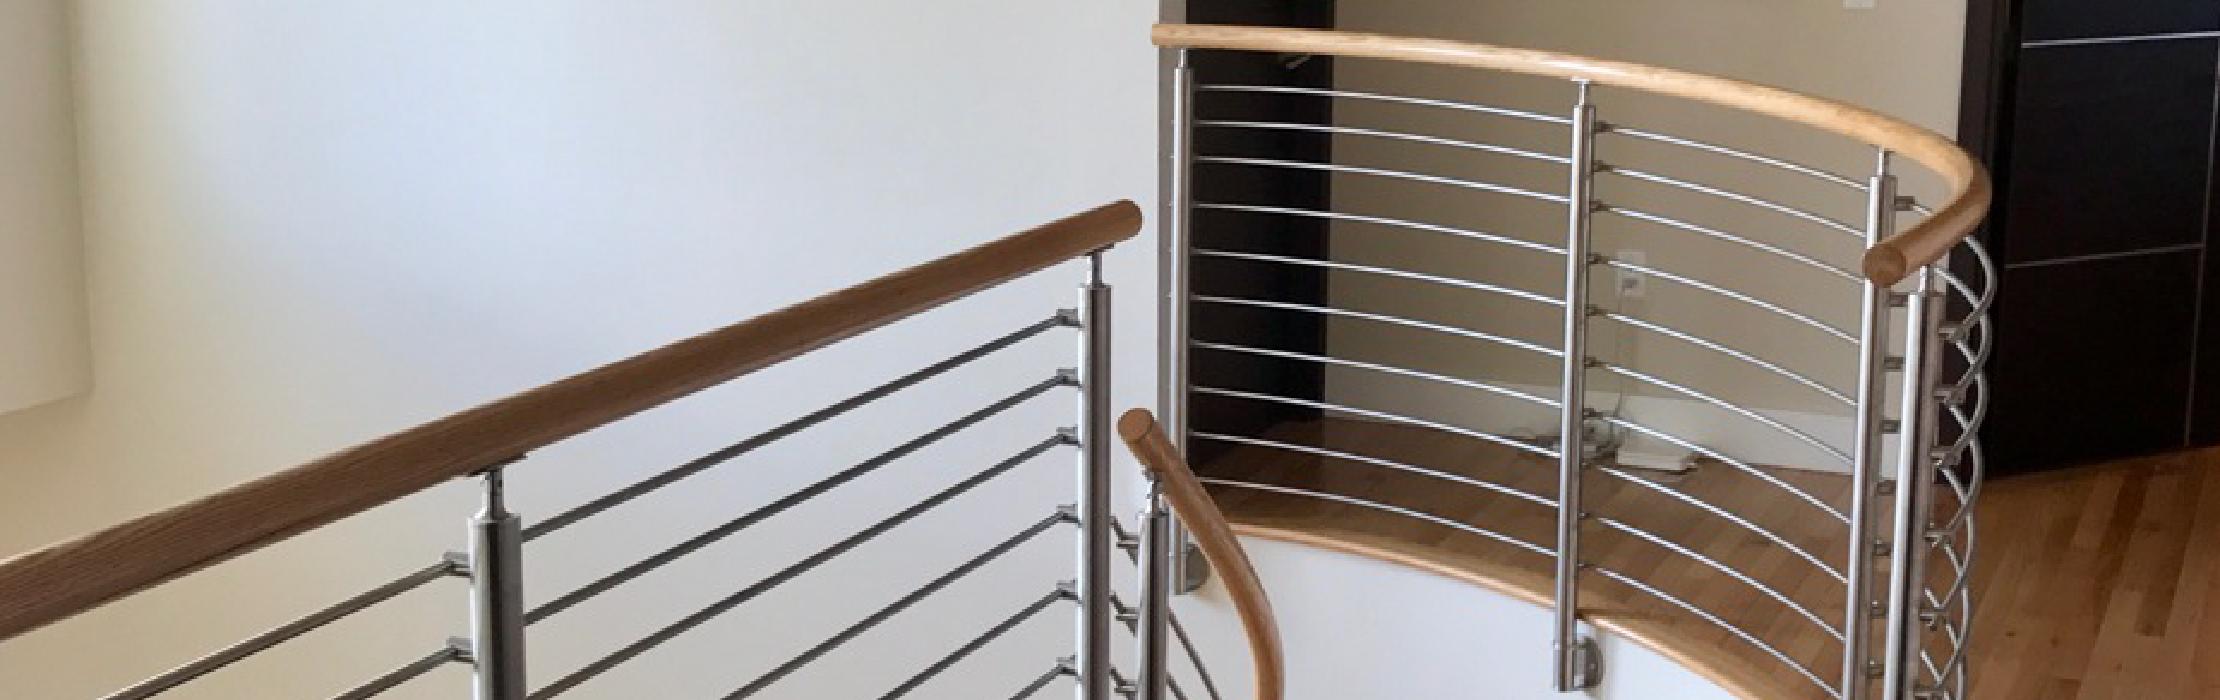 ᑕ❶ᑐ Stainless Steel Crossbar Railing Posts